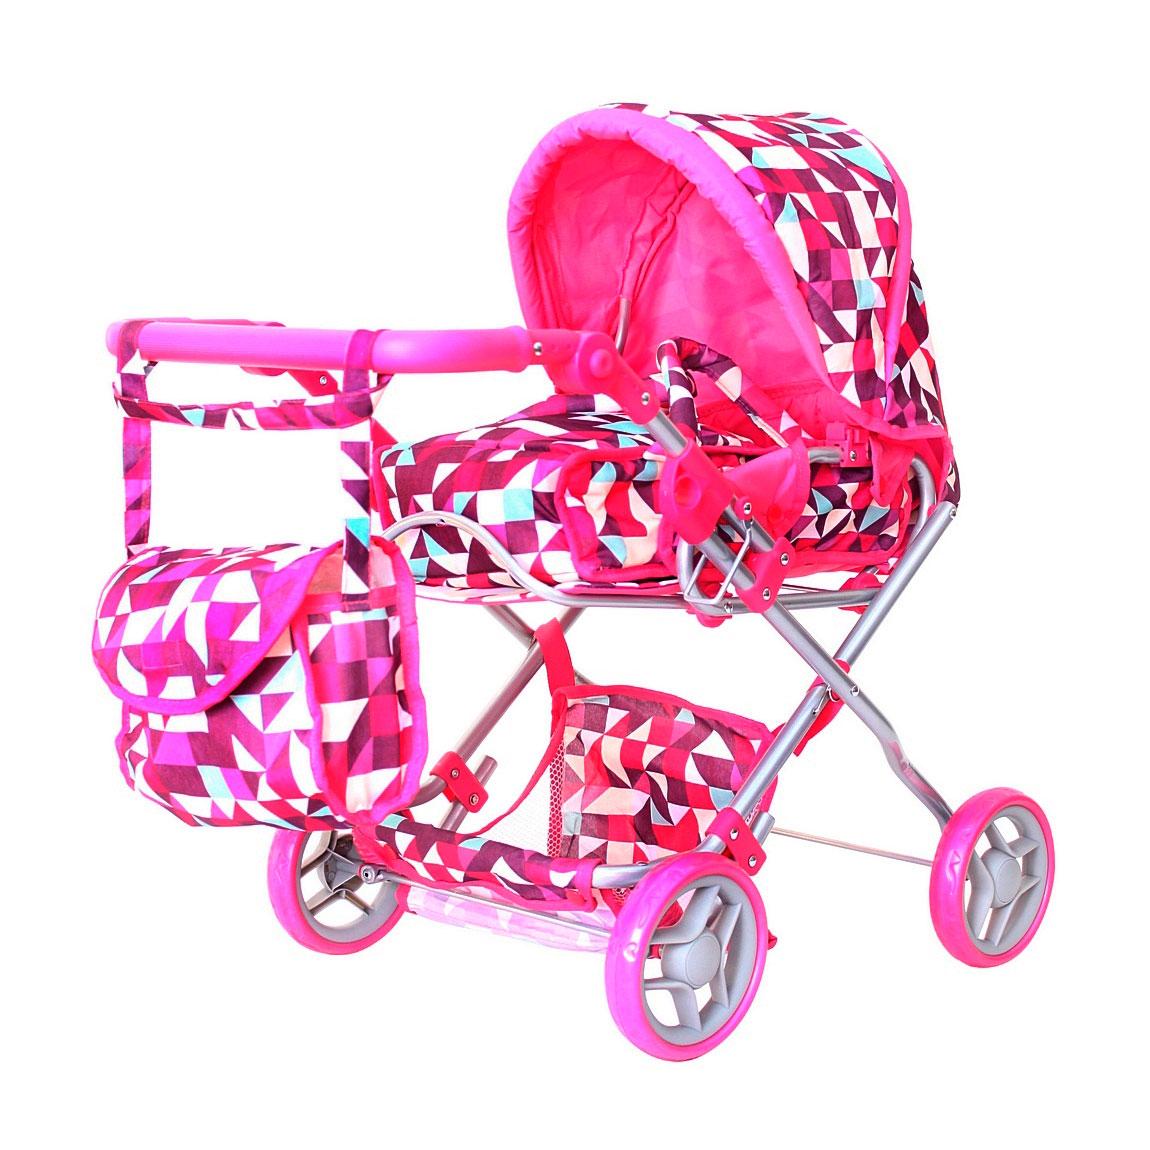 Кукольная коляска RT Розовые ромбы 9663-1<br>